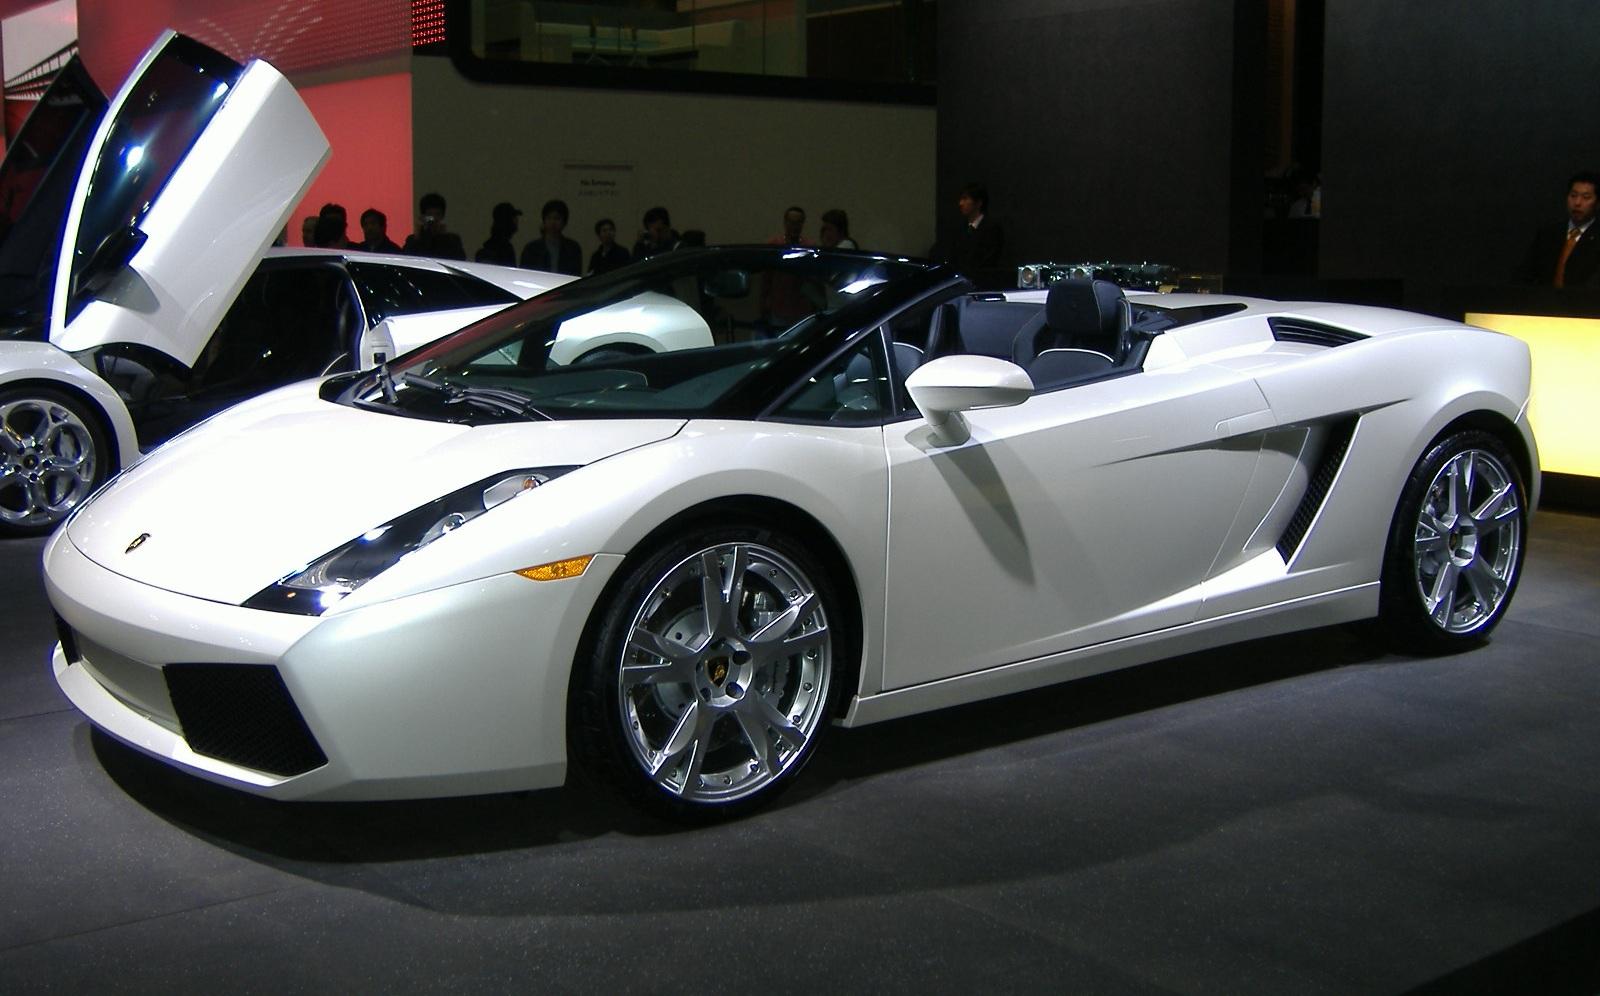 Superior File:Lamborghini Gallardo